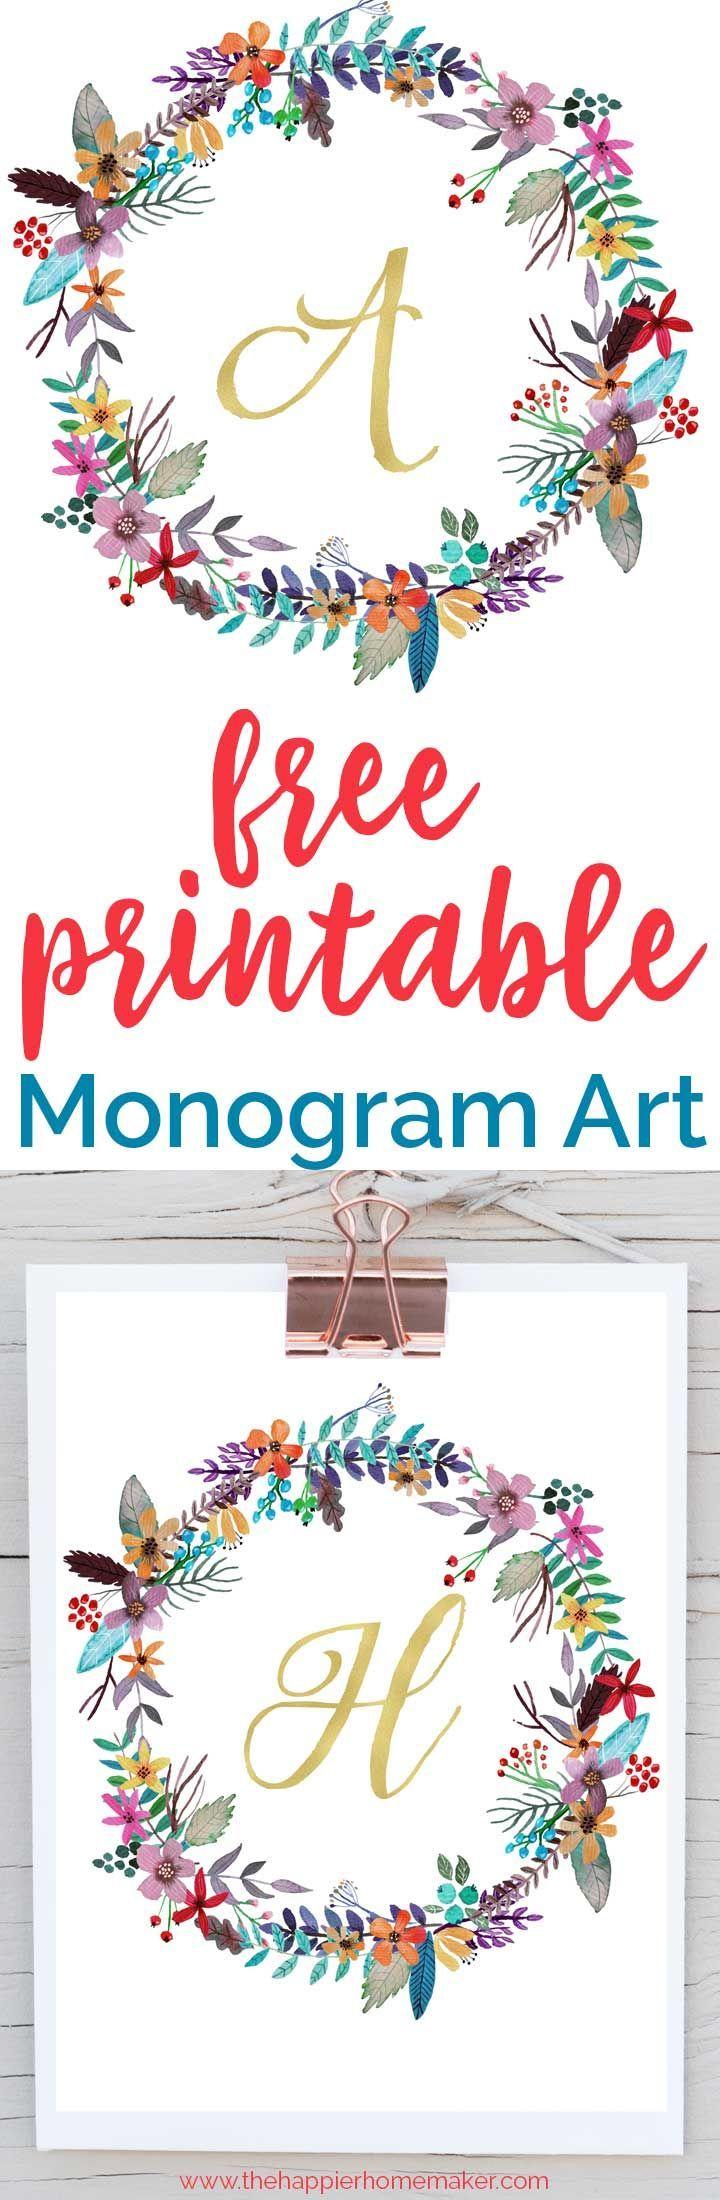 Free Printable Monogram Art | Free Printables | Pinterest | Free - Free Printable Monogram Letters